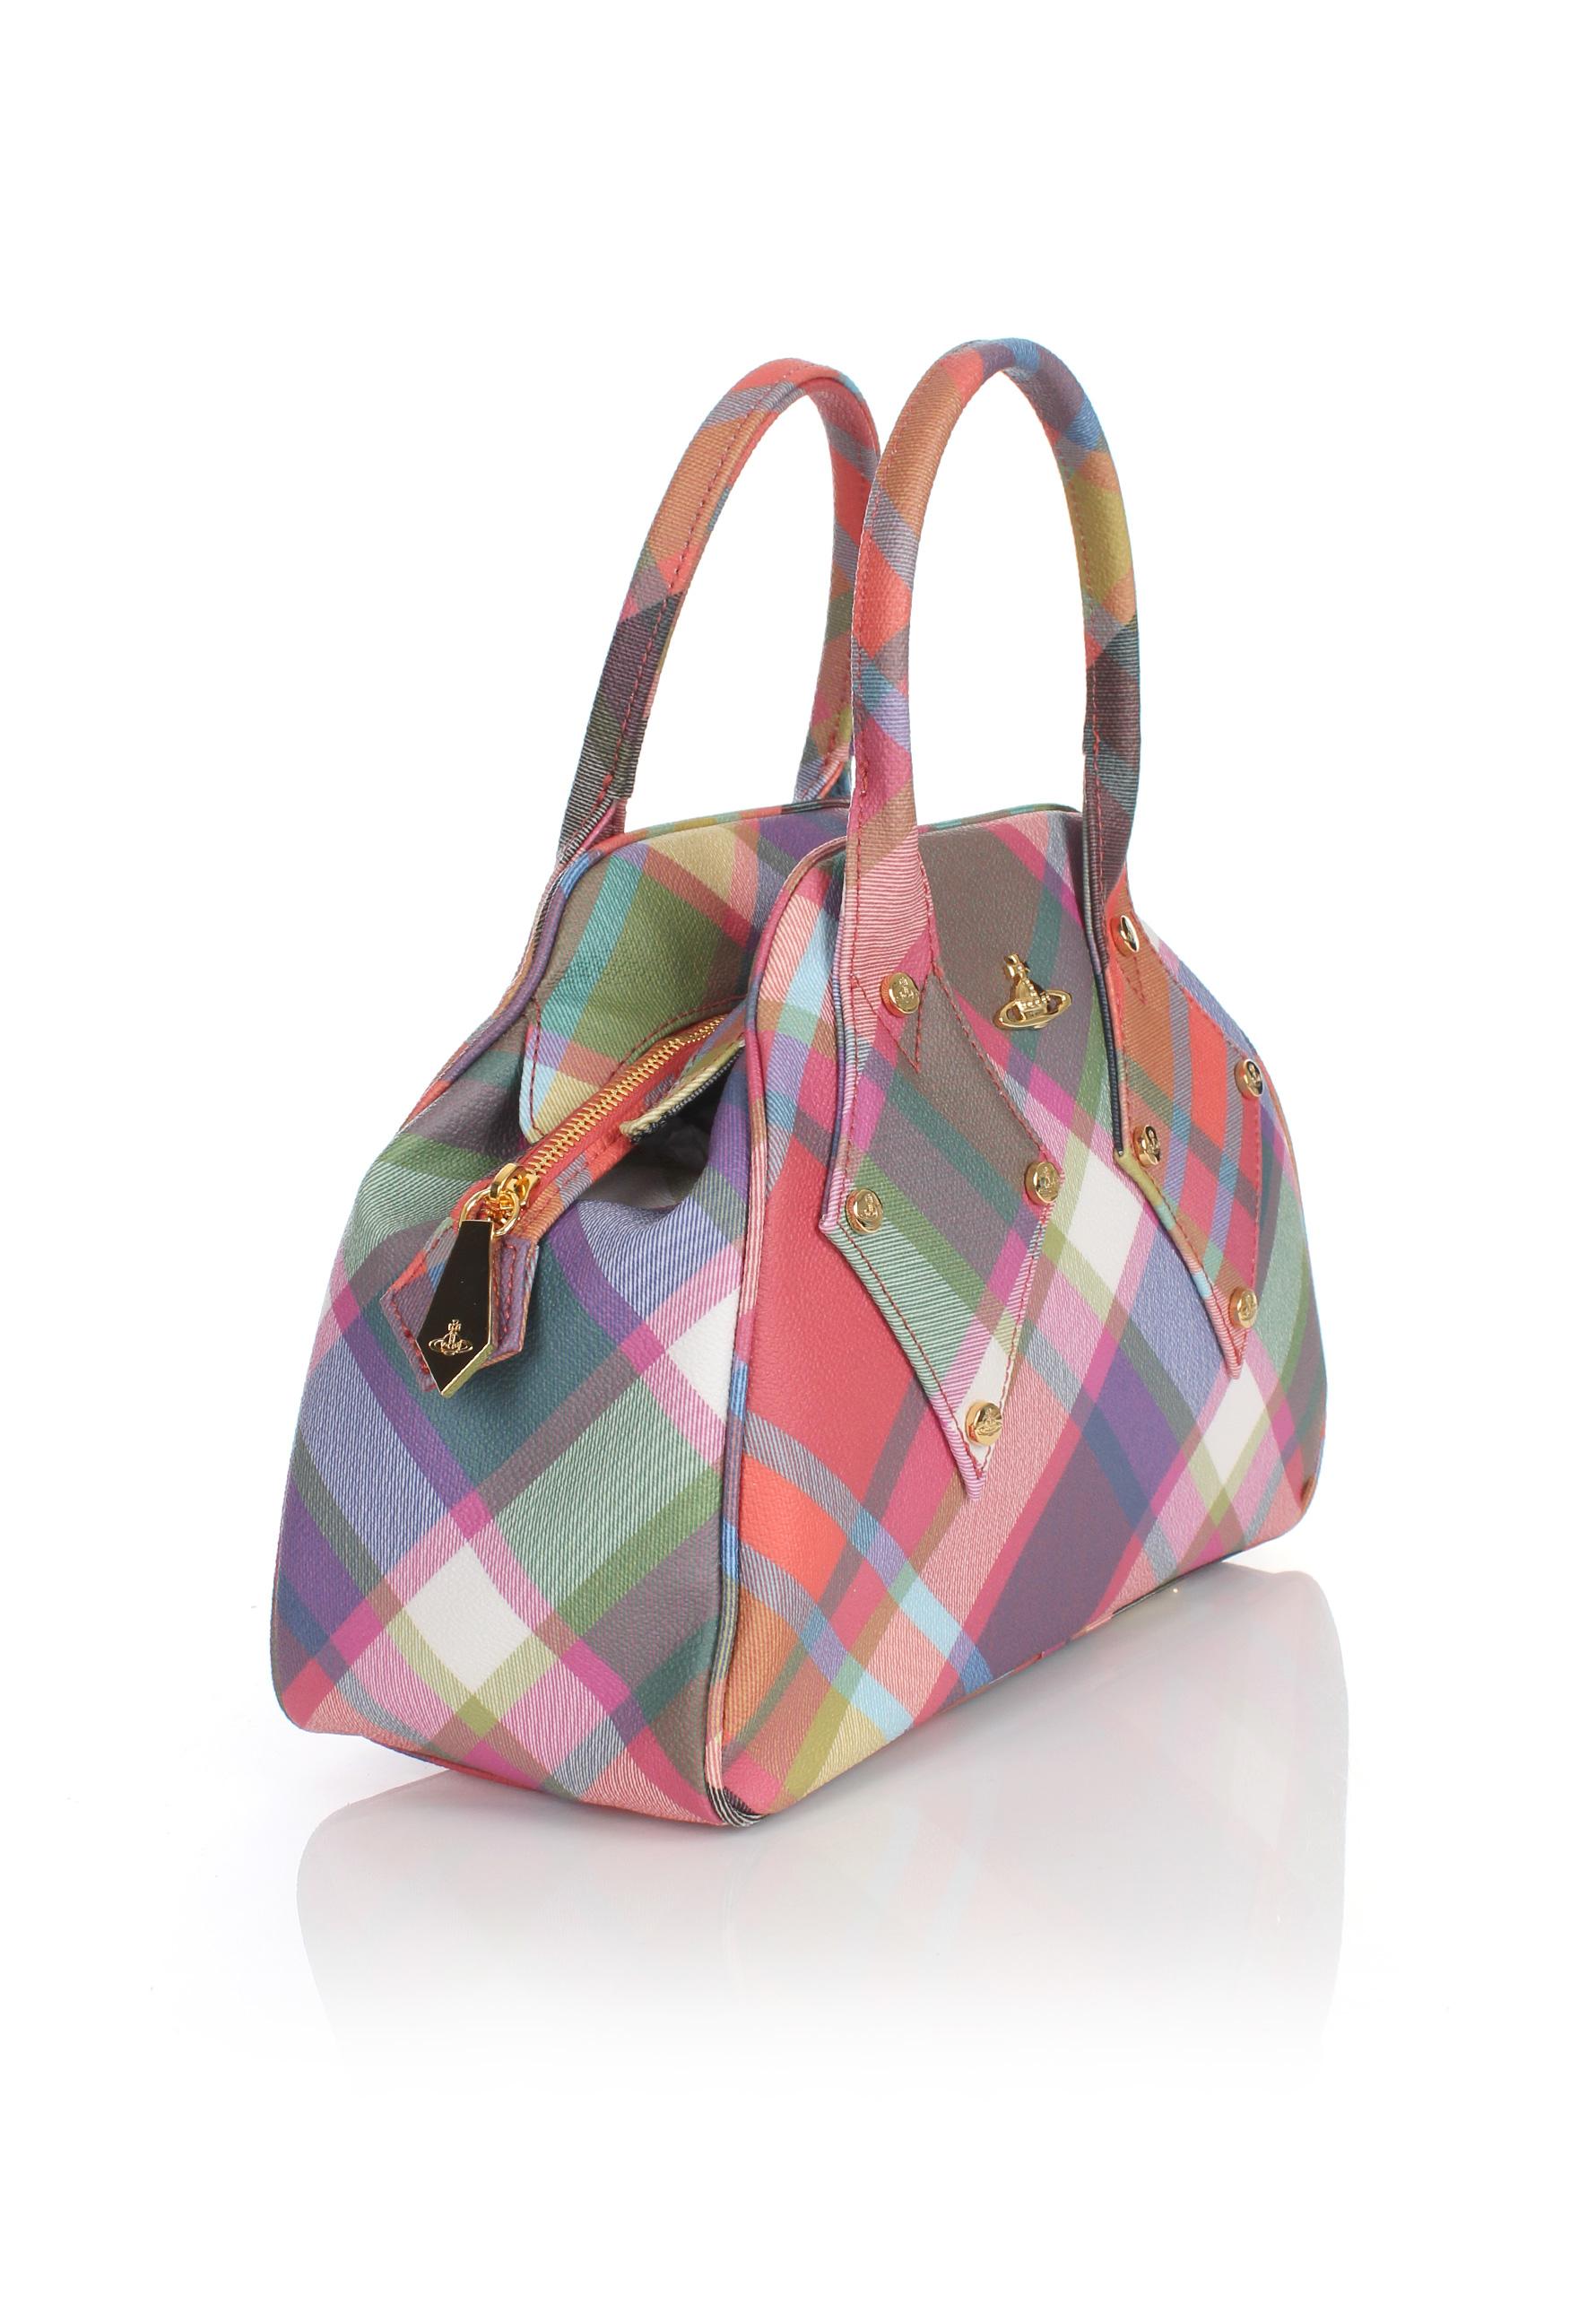 118fcc2124e Vivienne Westwood Derby 6673 Yasmine Bag Harlequin in Pink - Lyst